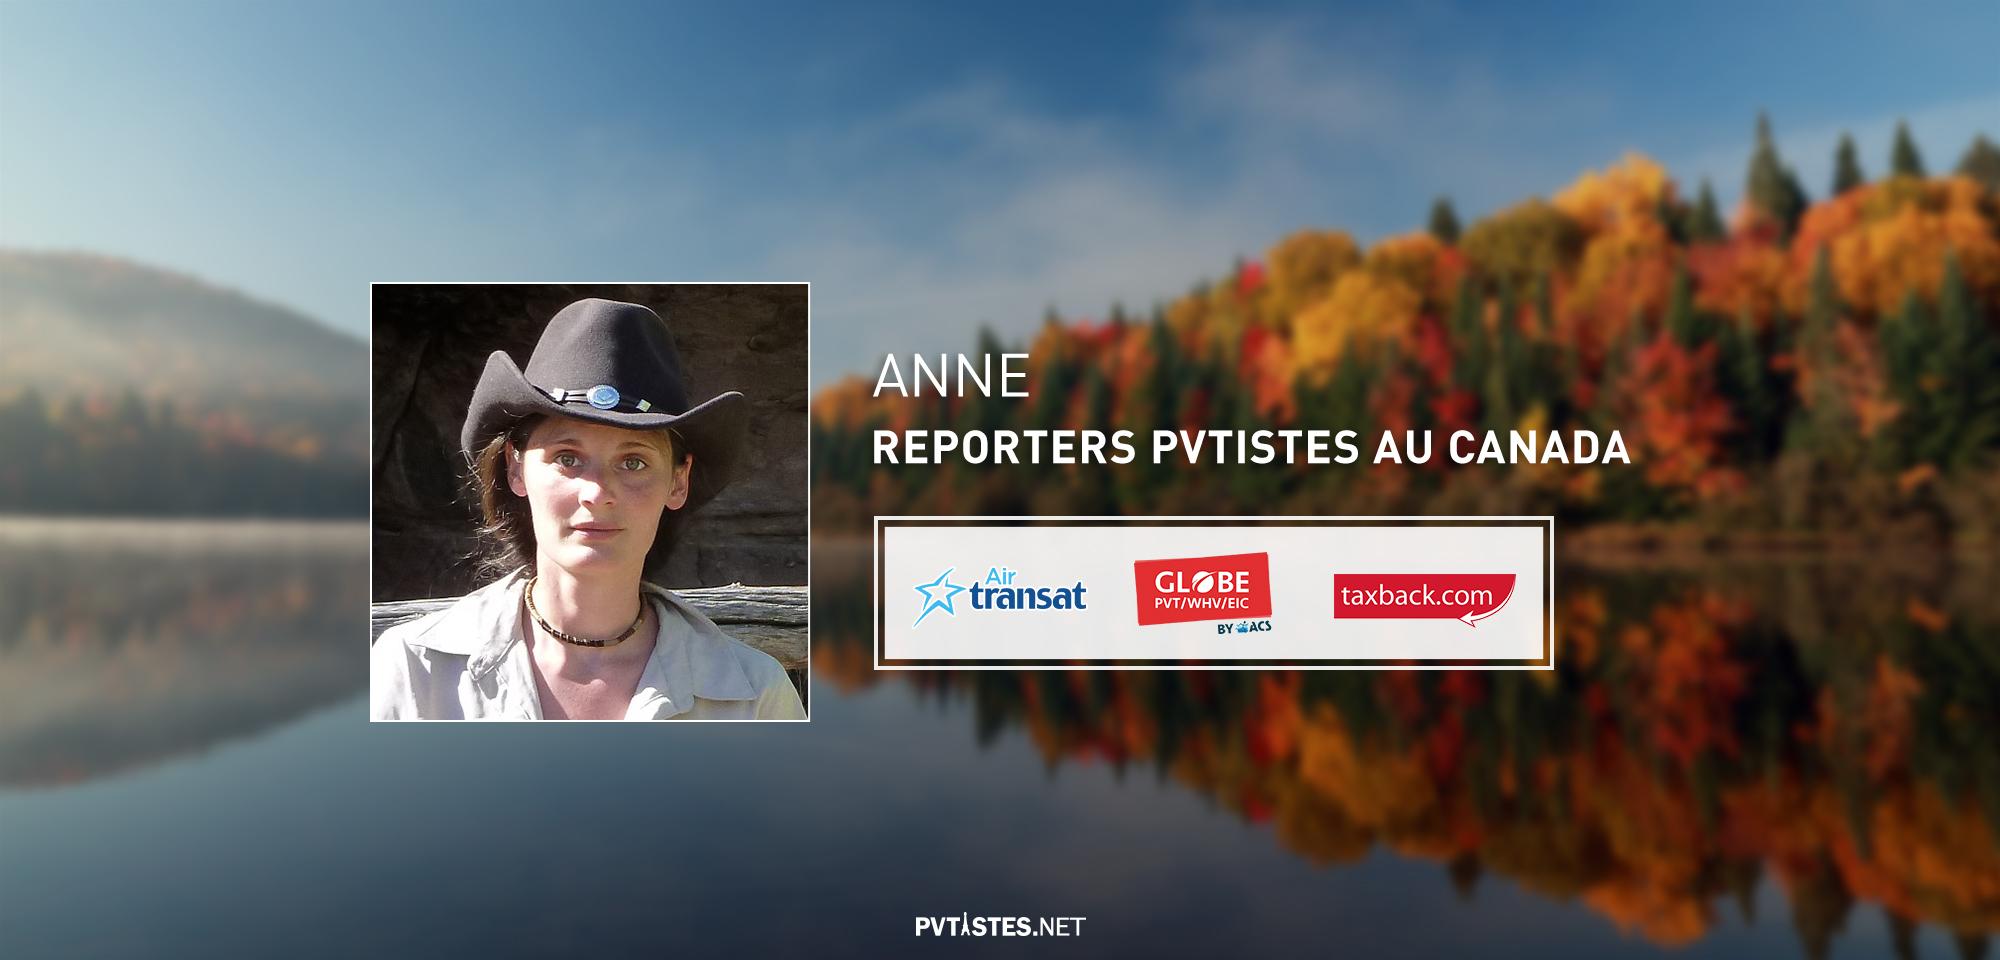 Arrivée au Canada de Anne, reporter PVTiste 2016